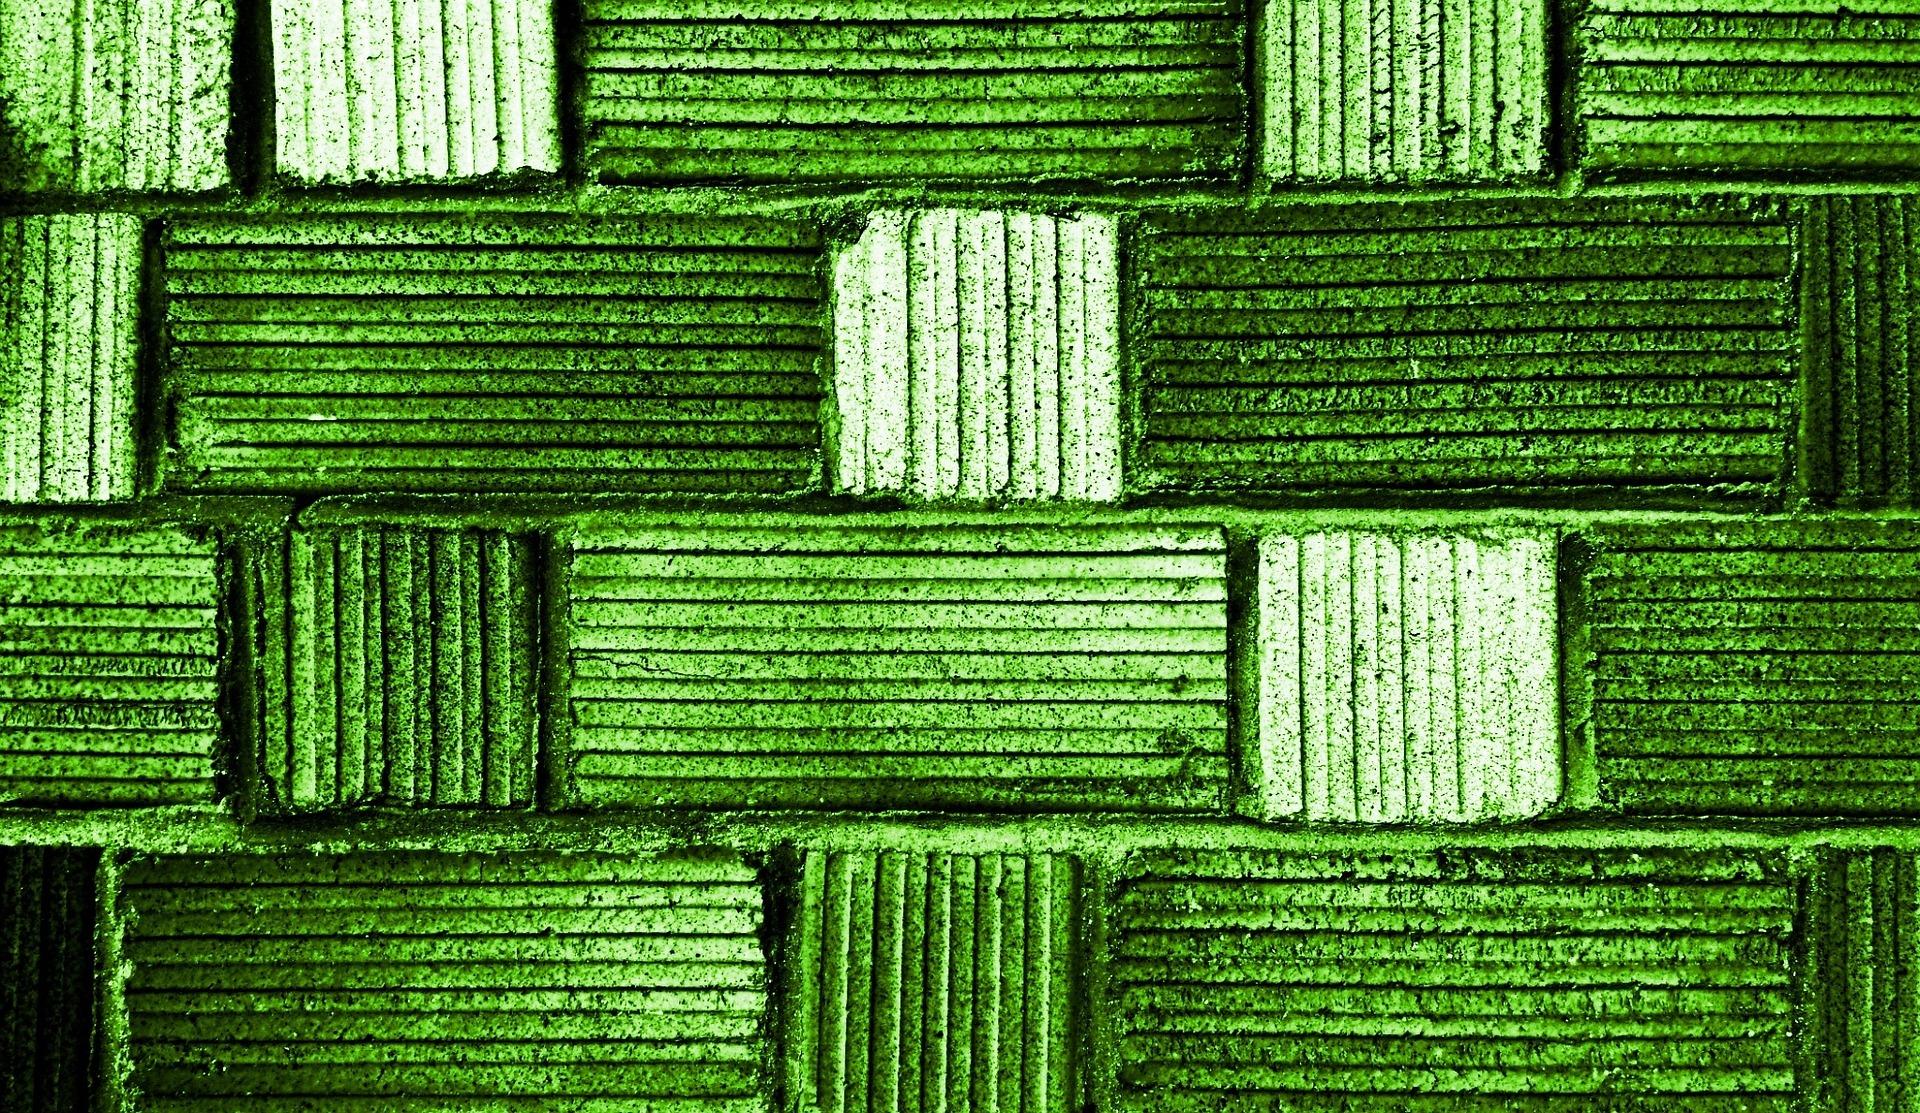 wall-813457_1920.jpg